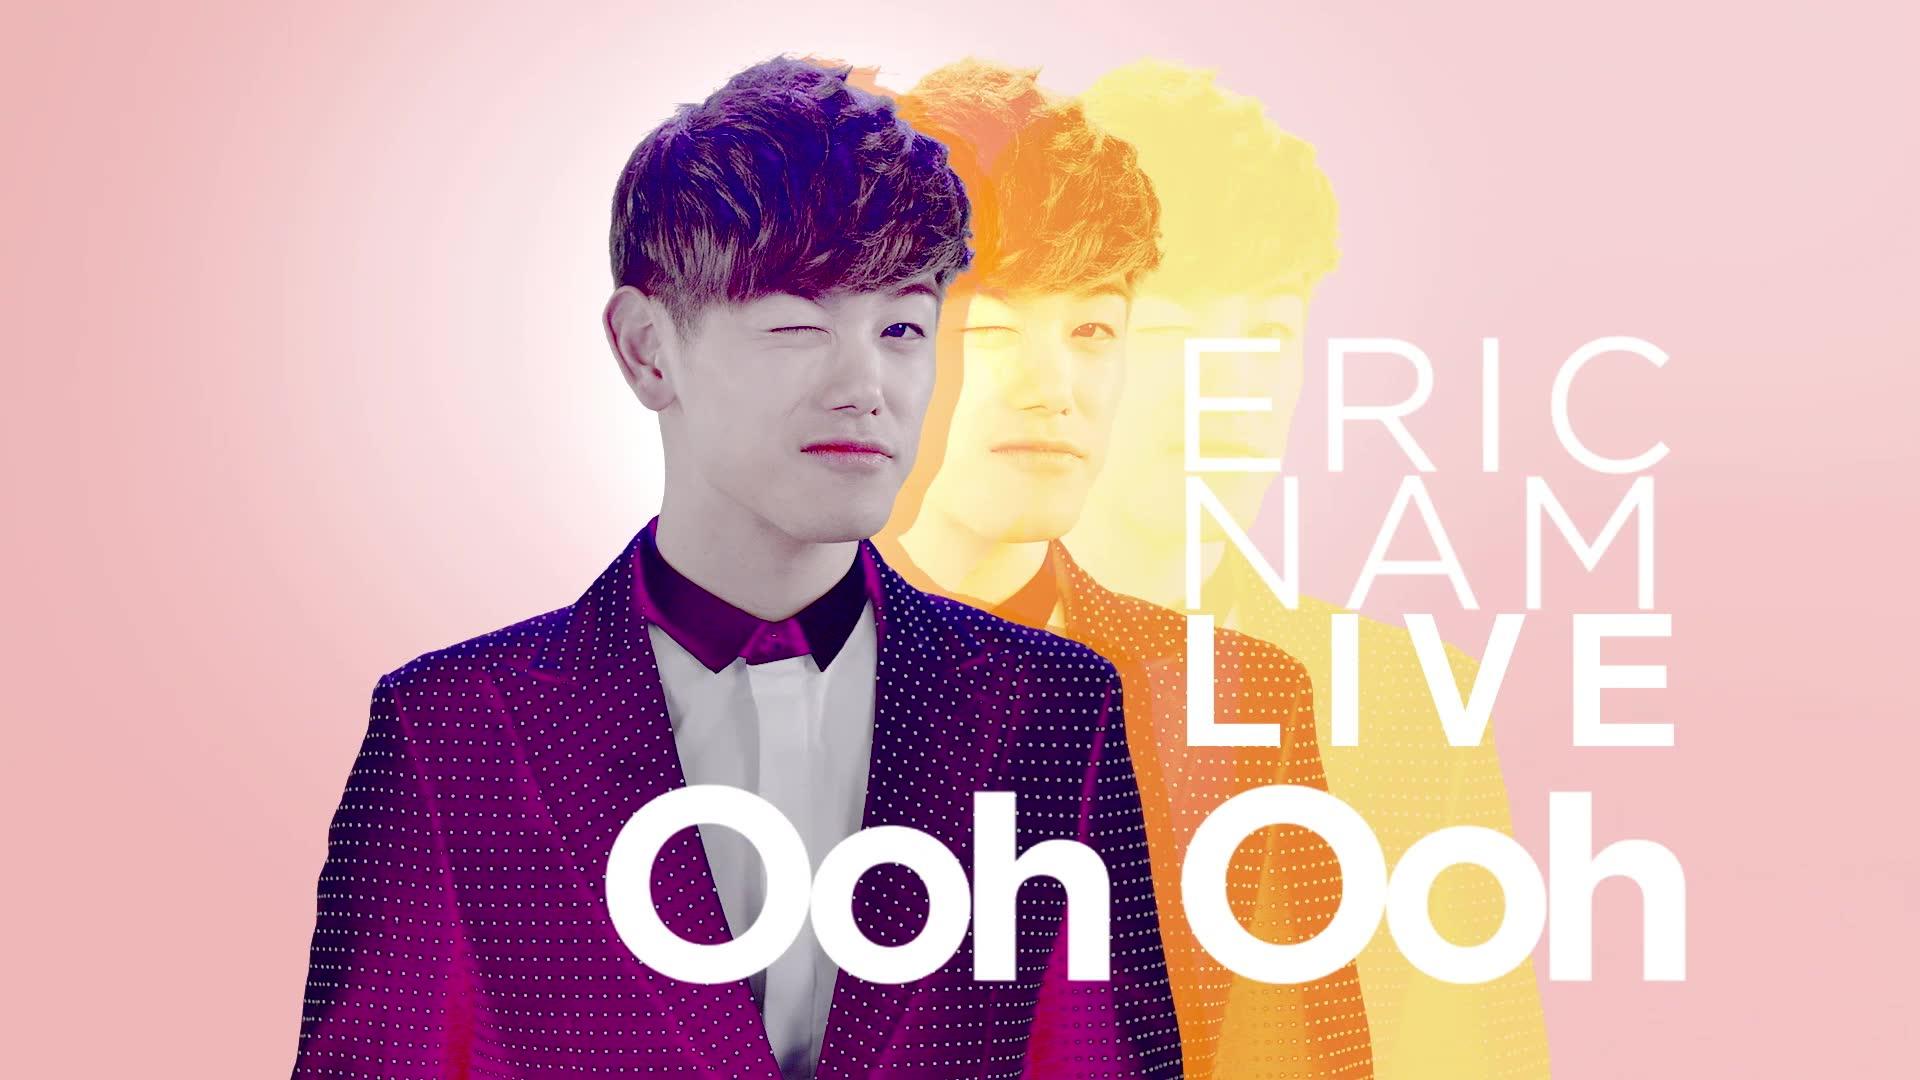 Eric Nam Videos: Ooh Ooh (Feat. Hoya of Infinite)